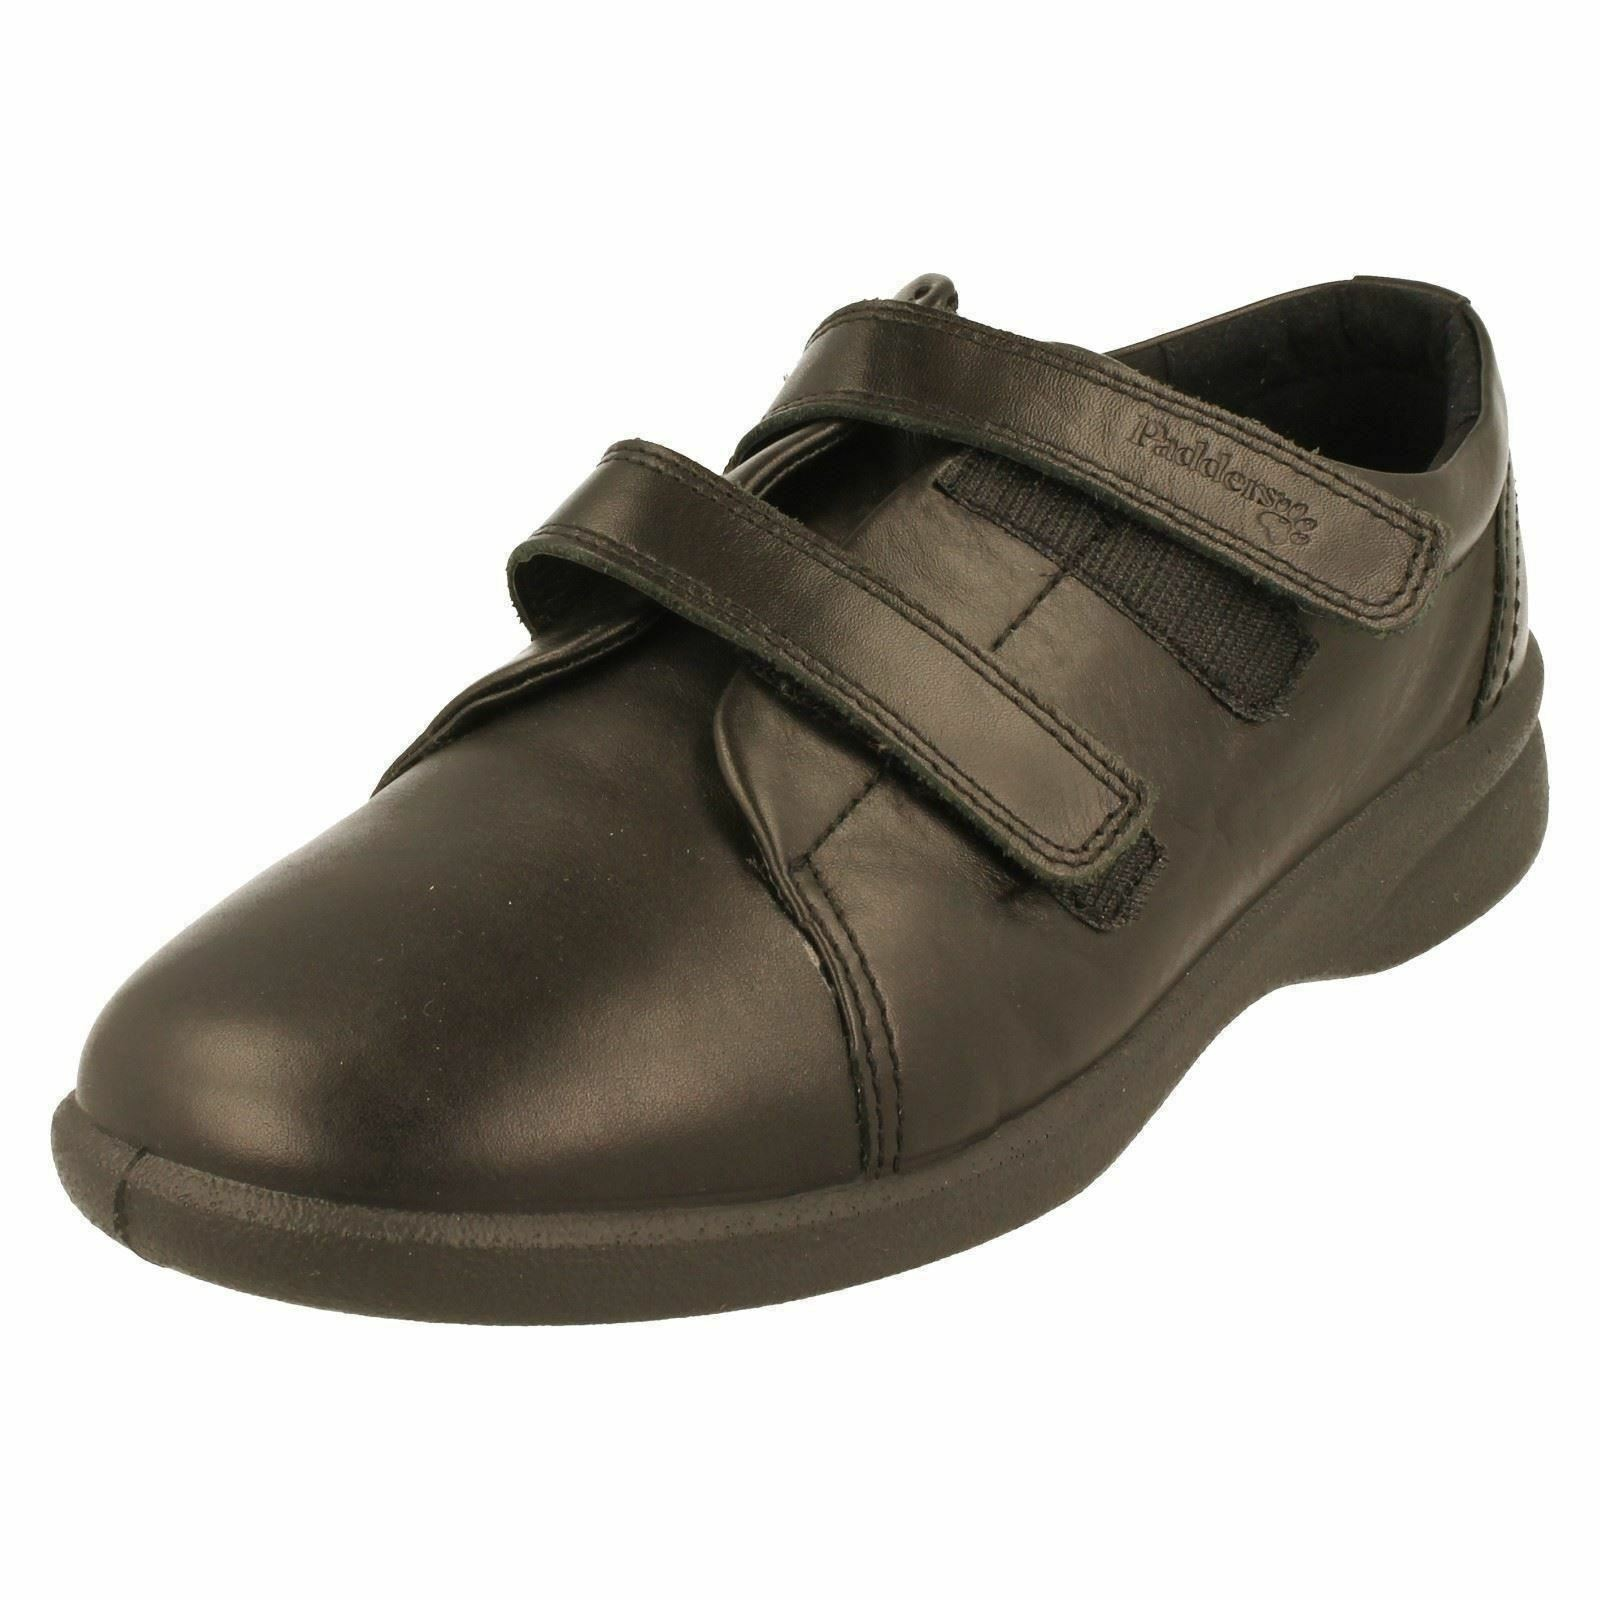 Mujer Padders 3e 4e Ajuste Zapatos negros negros negros de piel - talla UK 4.5 - REVIVE  entrega rápida